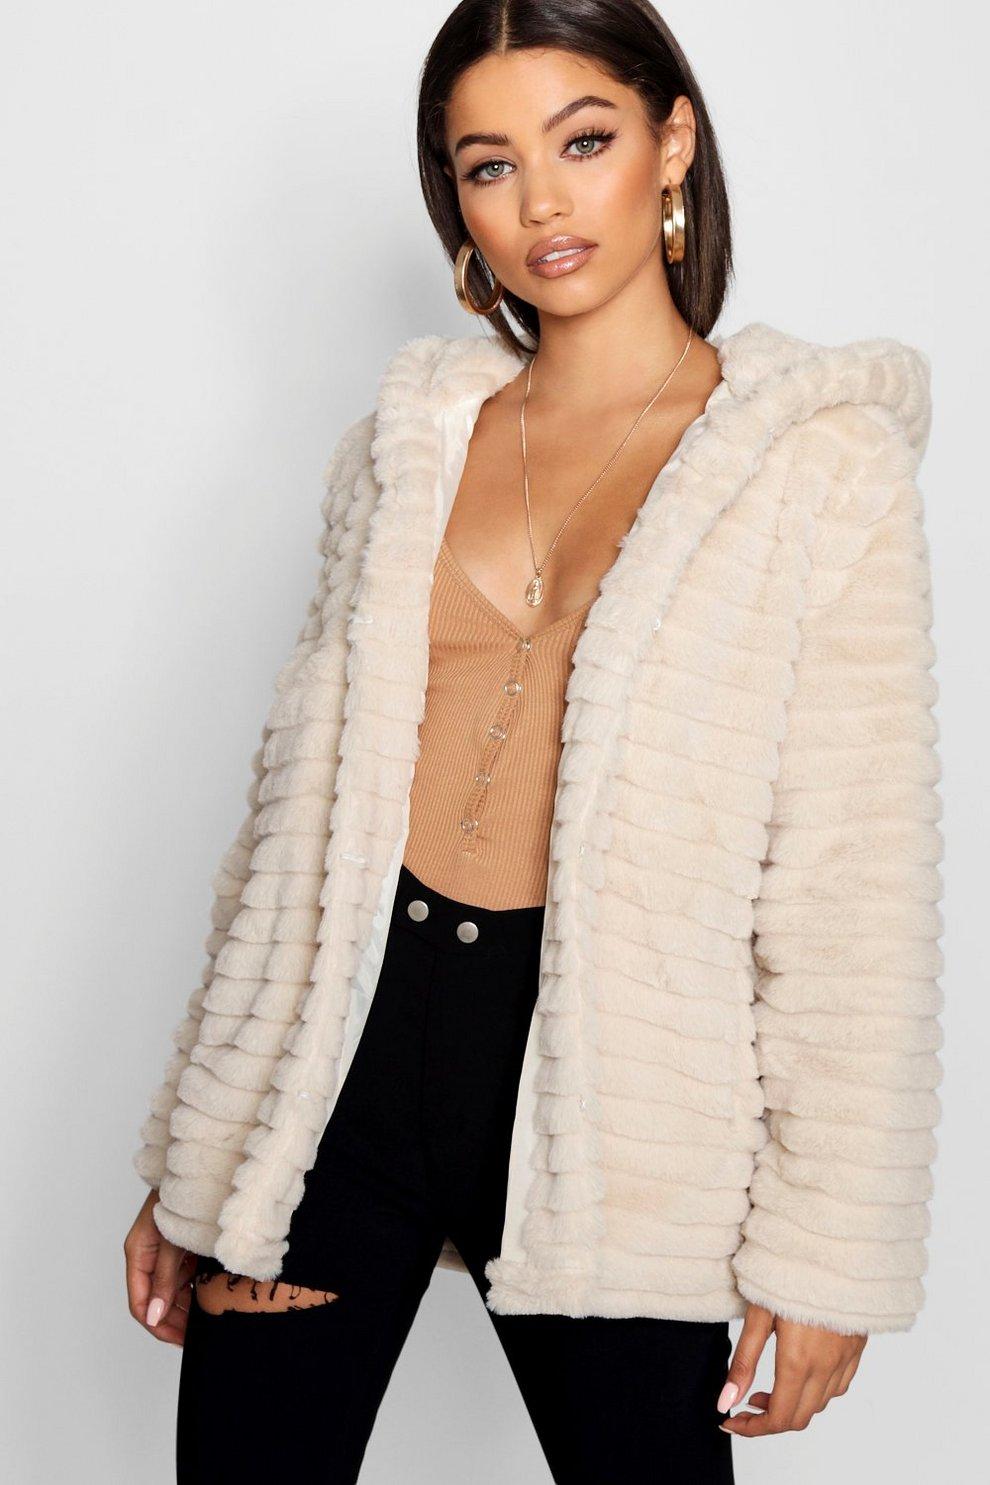 b2701f87fd38 Womens Cream Hooded Faux Fur Coat